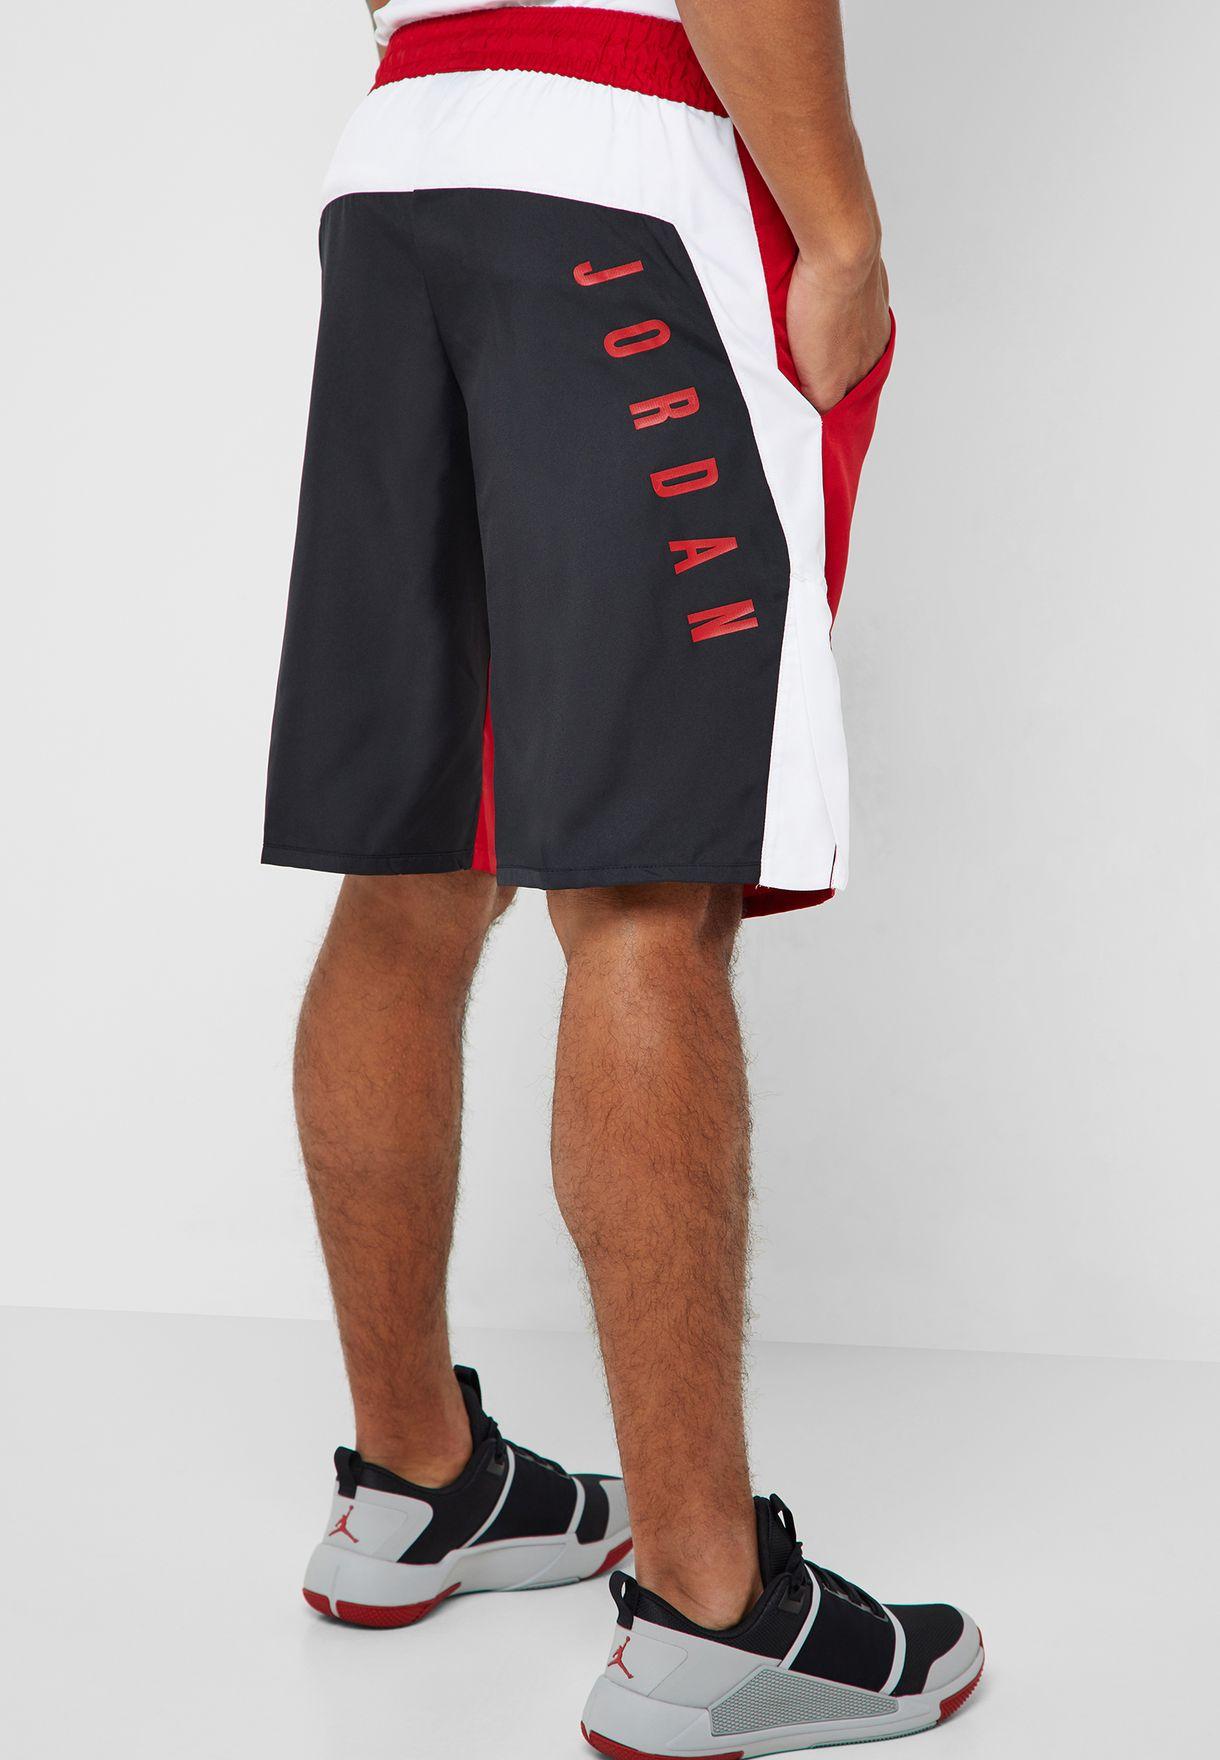 8cc2b60be5abf1 Shop Nike red Jordan Dri-FIT 23 Alpha Shorts AJ1046-687 for Men in ...